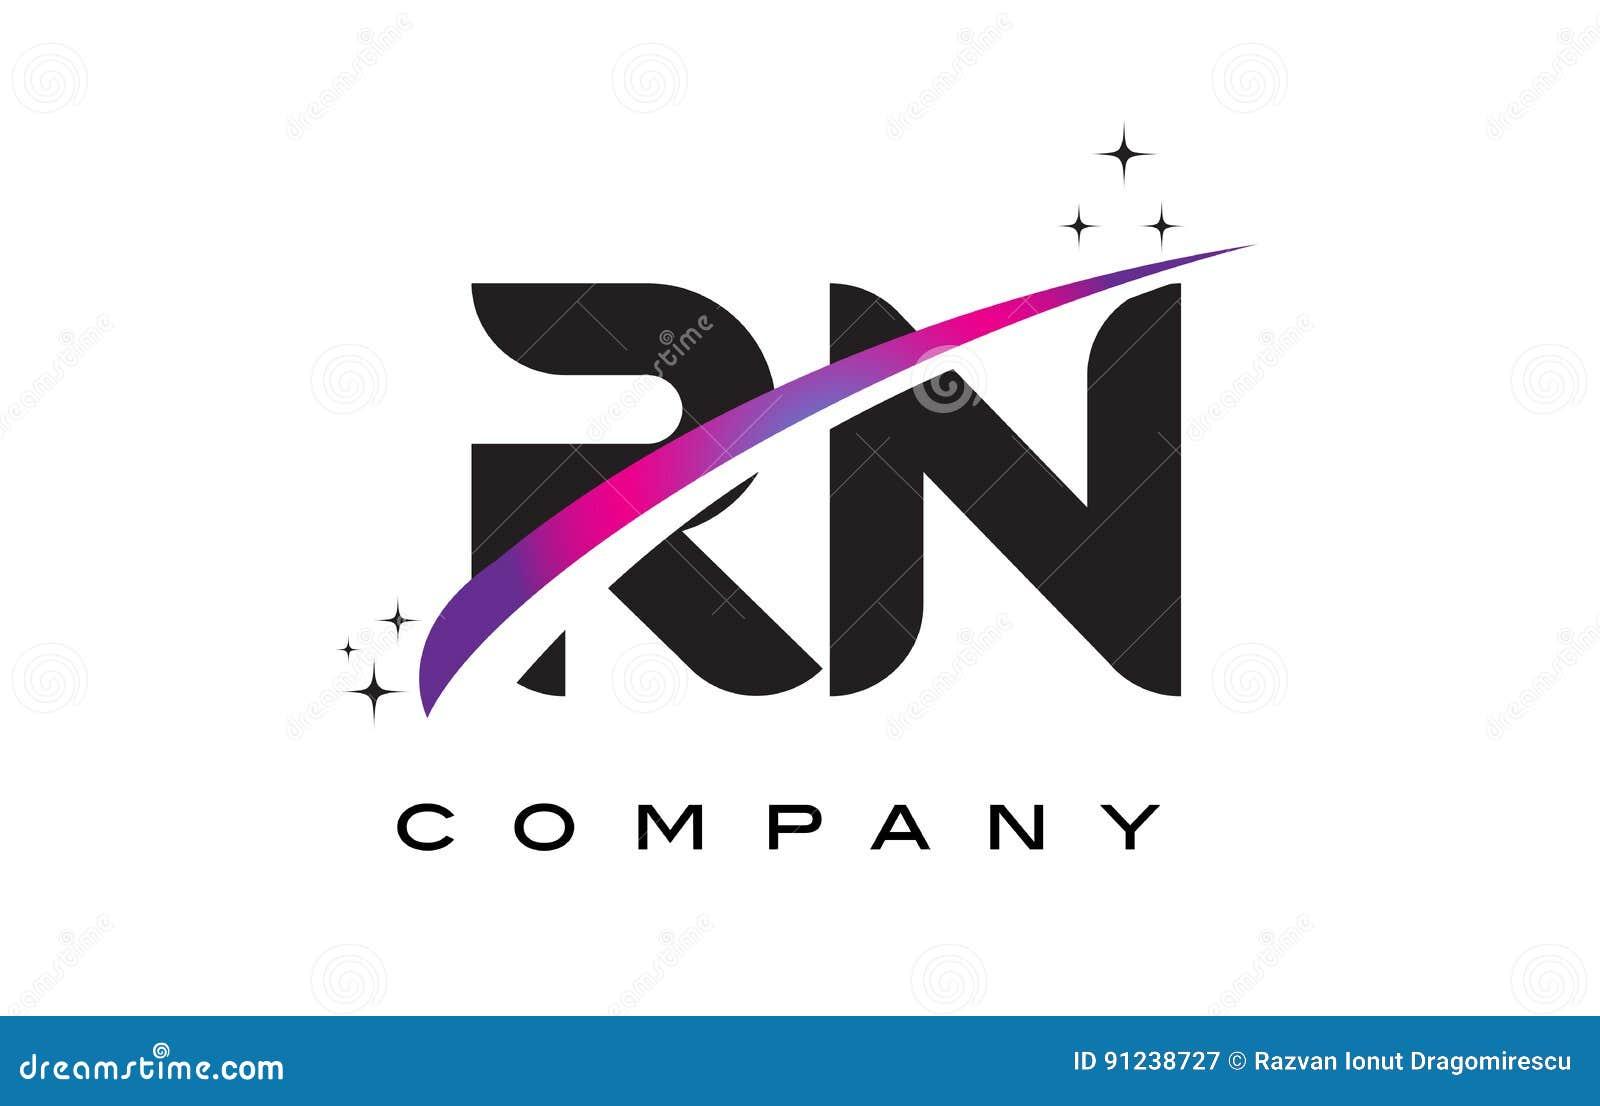 rn r n black letter logo design with purple magenta swoosh stock